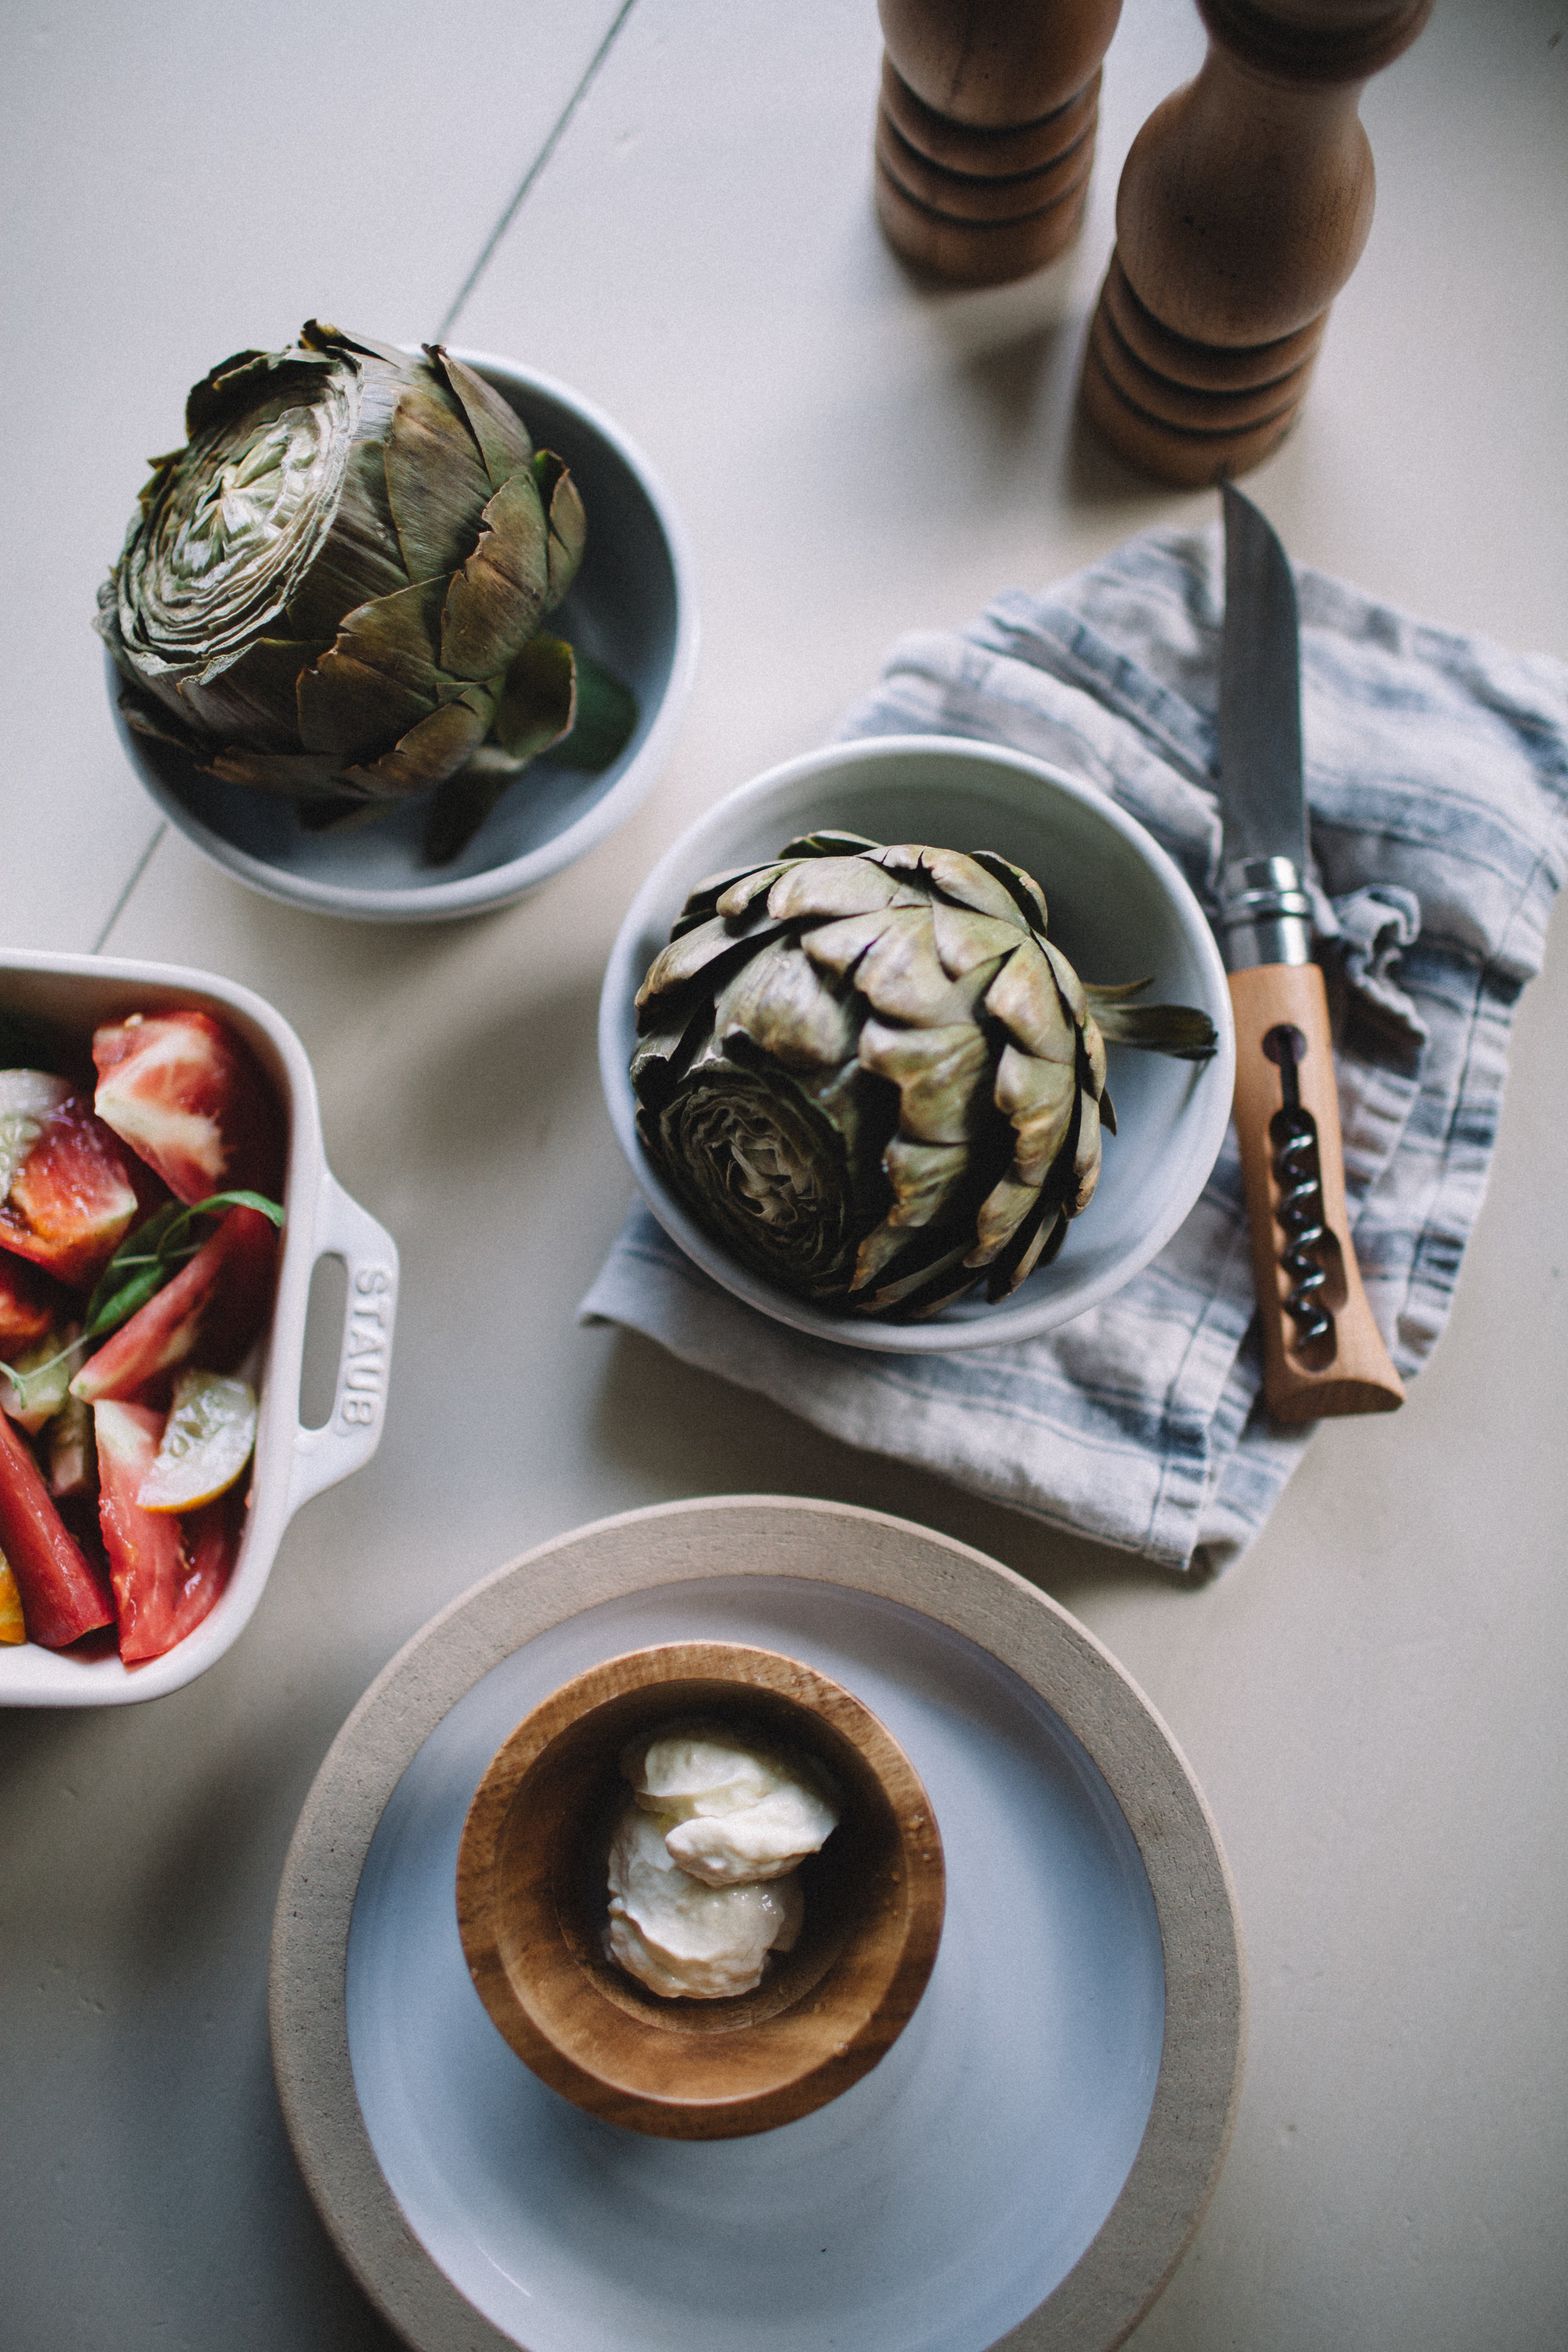 Steamed Artichokes with Lemon Aioli + A Summer Tomato and Cucumber Salad | Marina Gunn